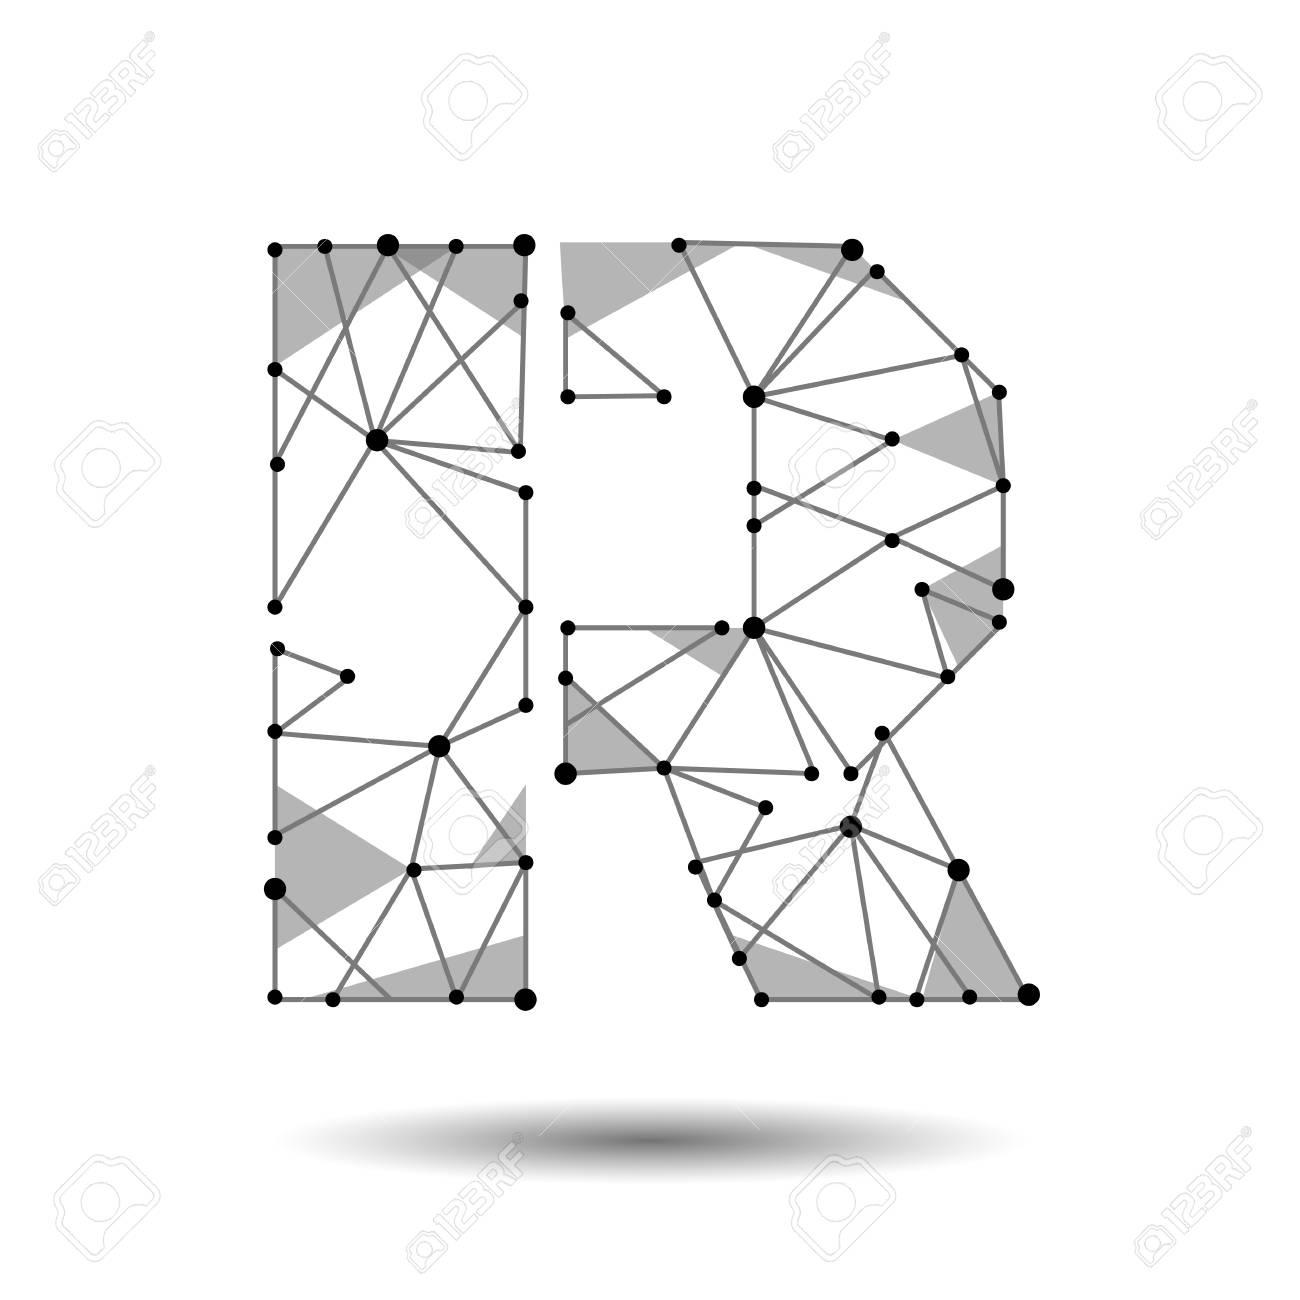 Low poly letter r english latin polygonal triangle connect dot low poly letter r english latin polygonal triangle connect dot point line black white altavistaventures Images